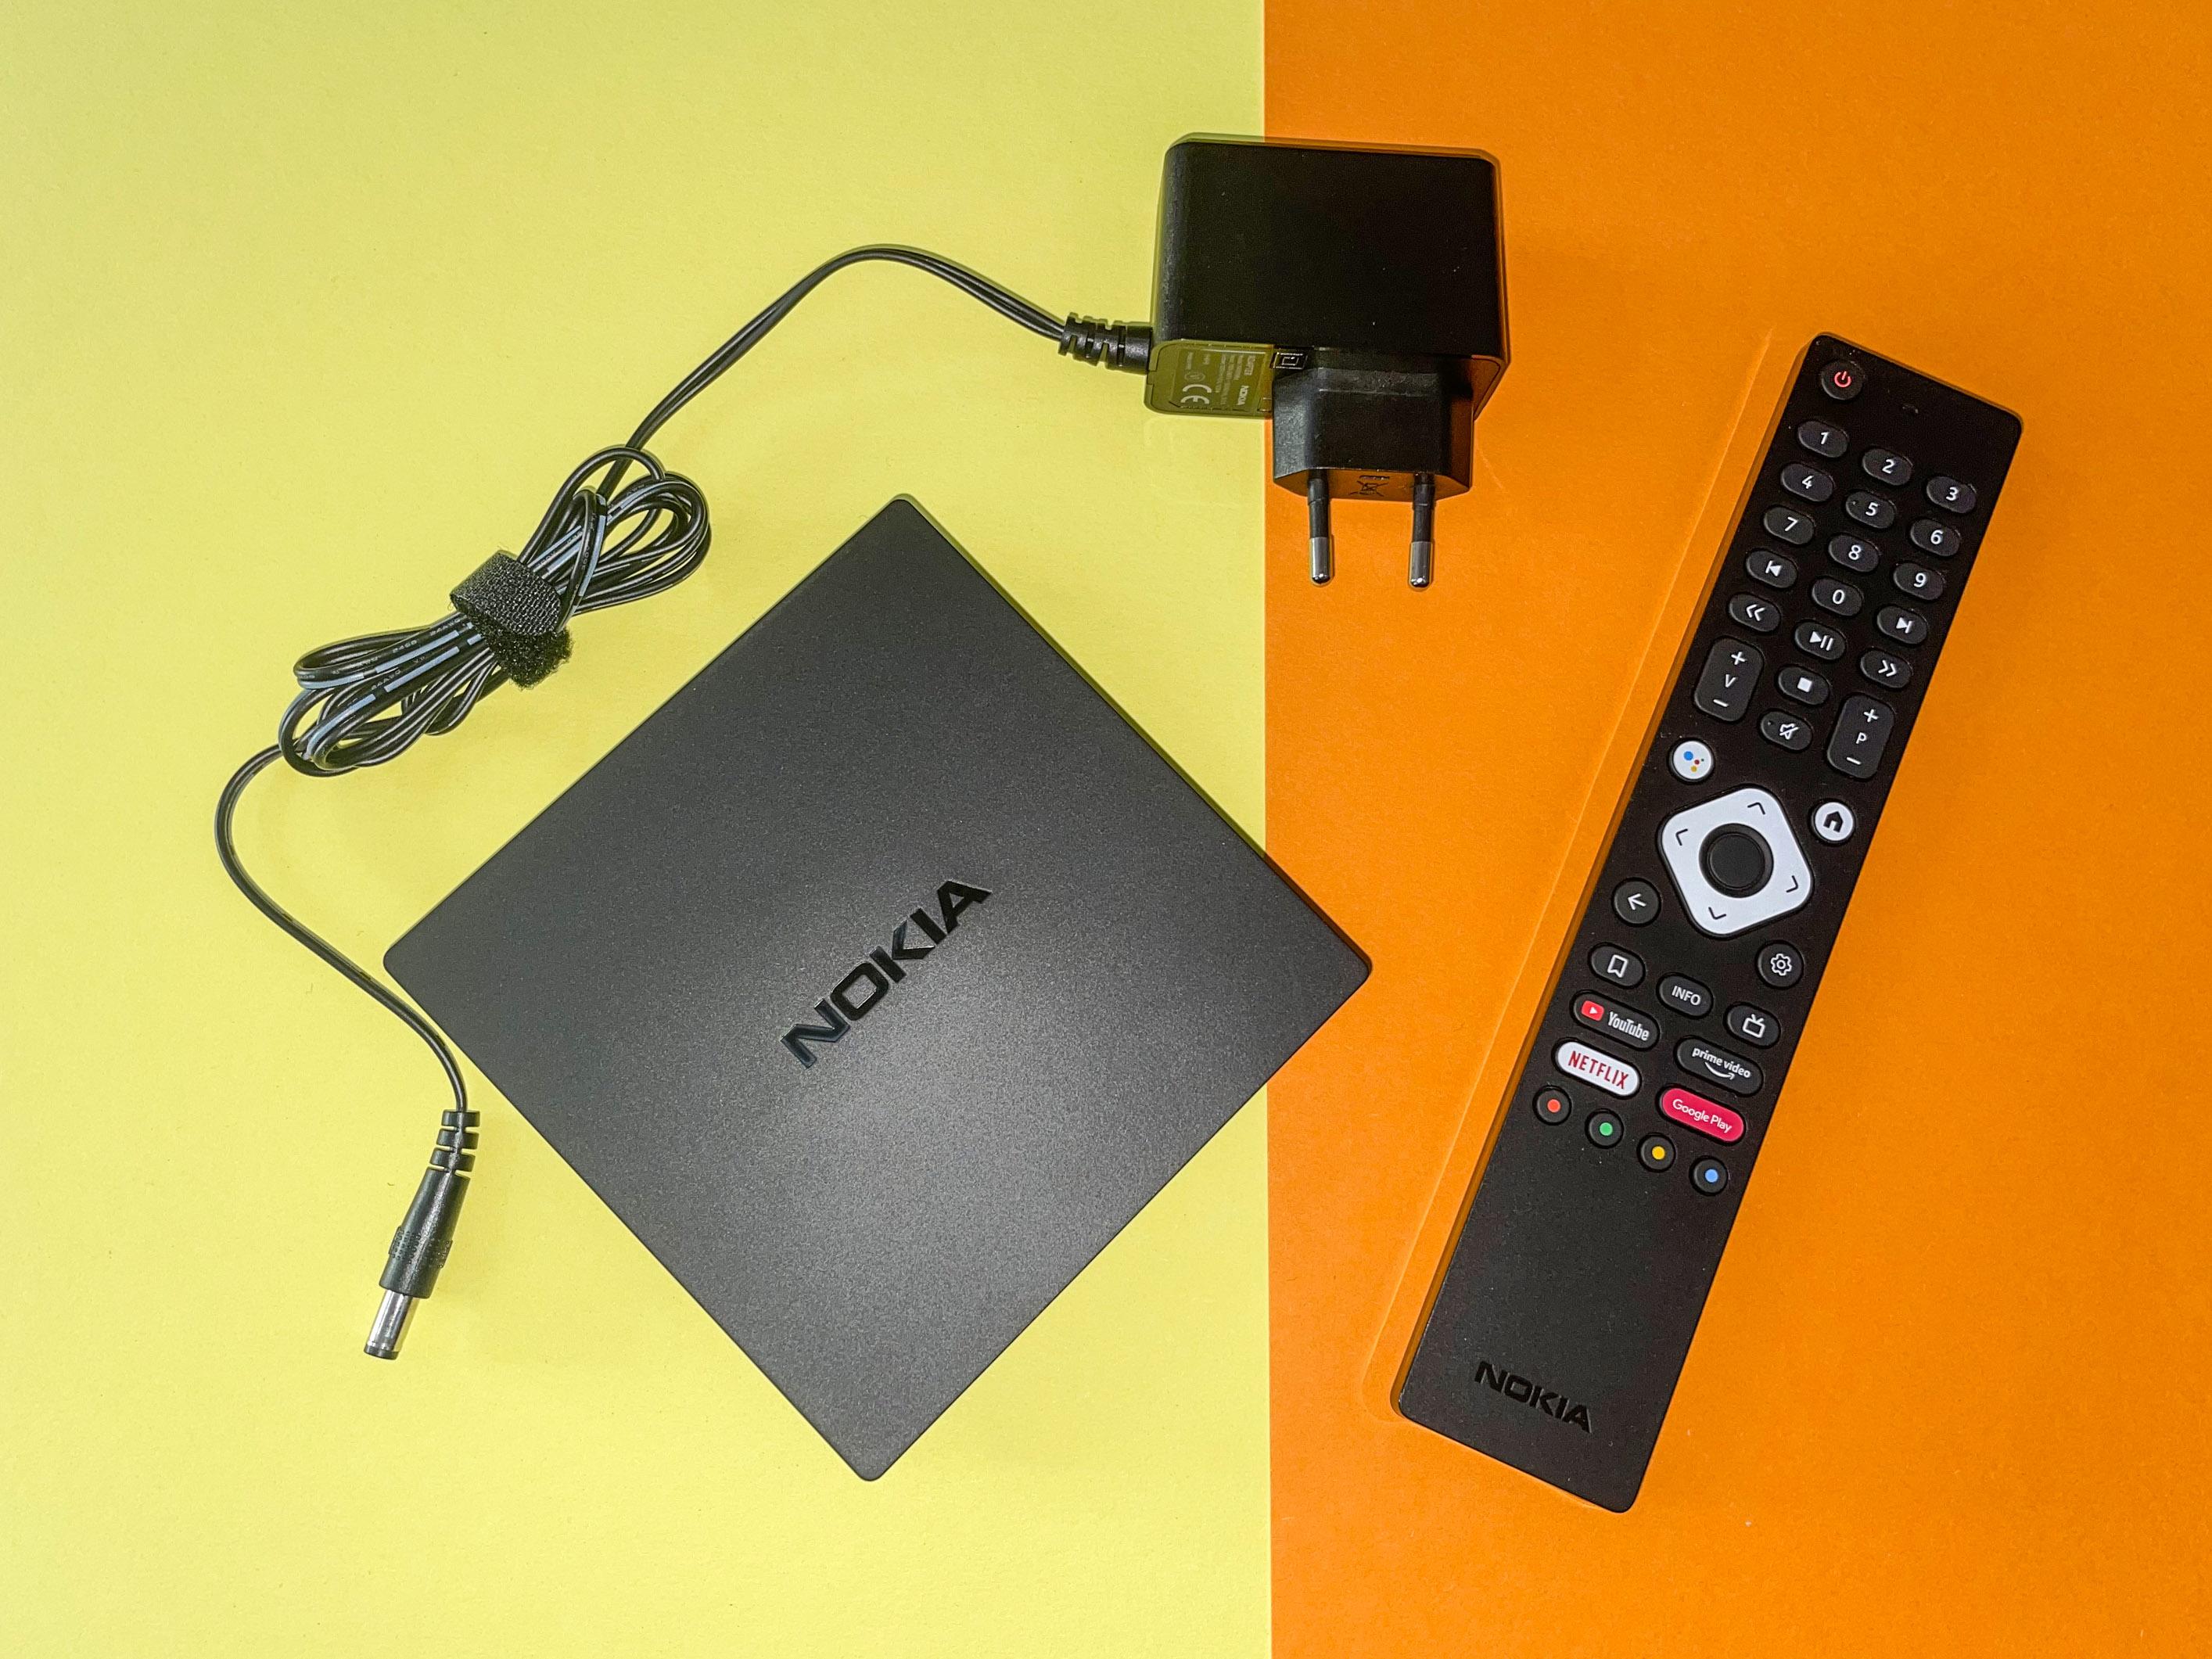 Android-TV-Geräte im Vergleichstest: Nokia-Box begeistert, Xiaomi-Stick enttäuscht - Nokias Streaming Box 8000 (Bild: Ingo Pakalski/Golem.de)